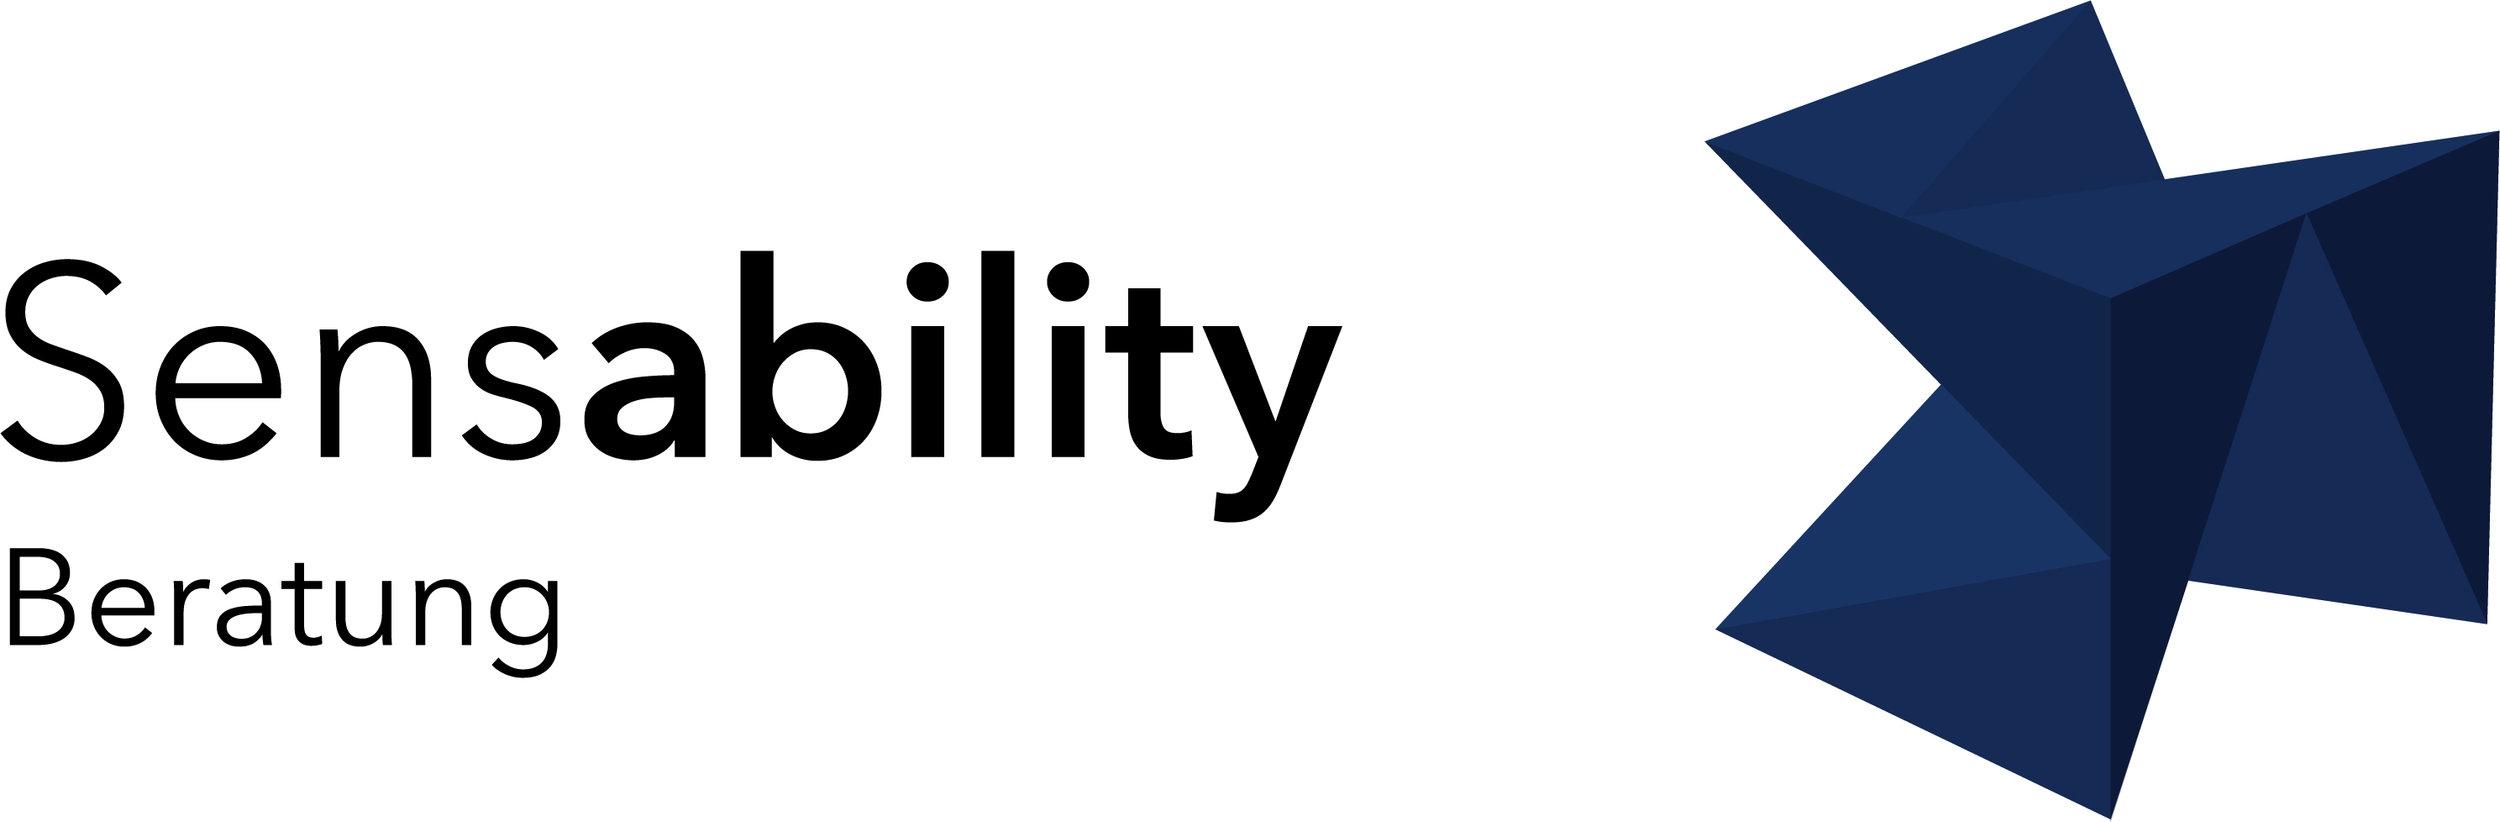 "Themen-Logo Beratung: Schrift ""Sensability Beratung"" mit Würfel in der Farbe Dunkelblau"